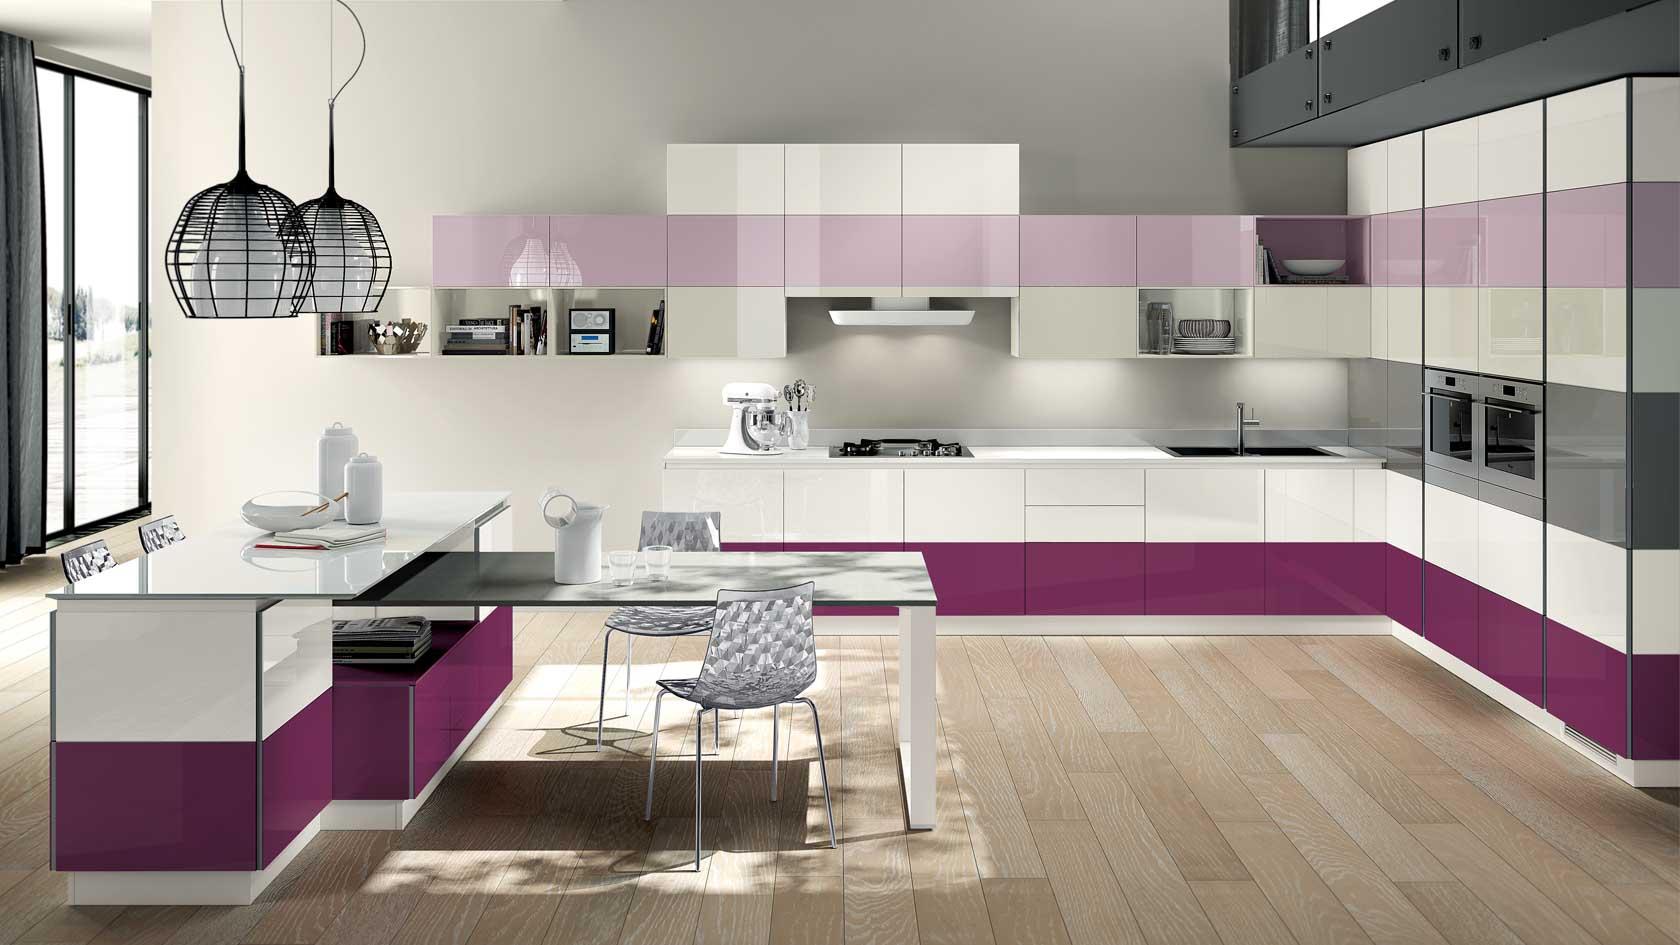 Awesome Marche Cucine Di Qualità Pictures - acrylicgiftware.us ...